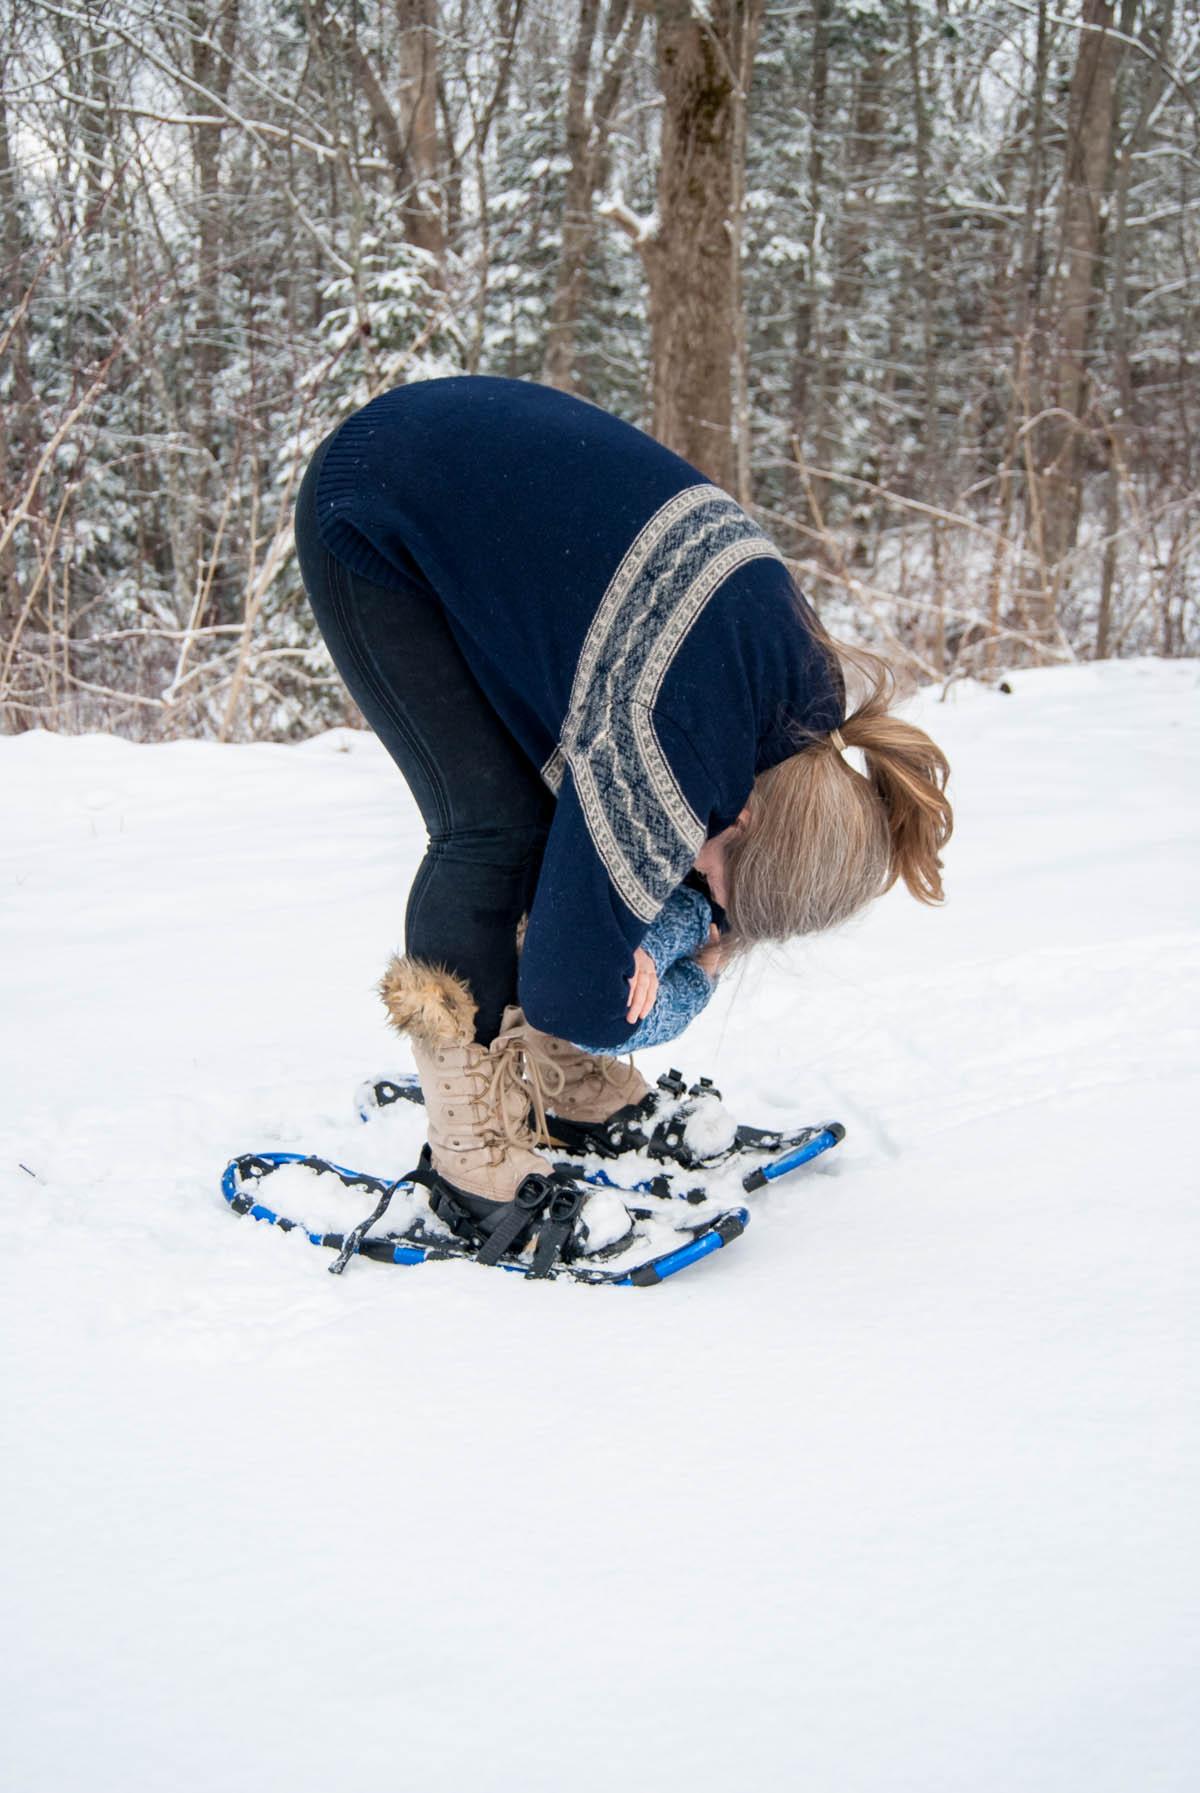 Forward fold in the snow